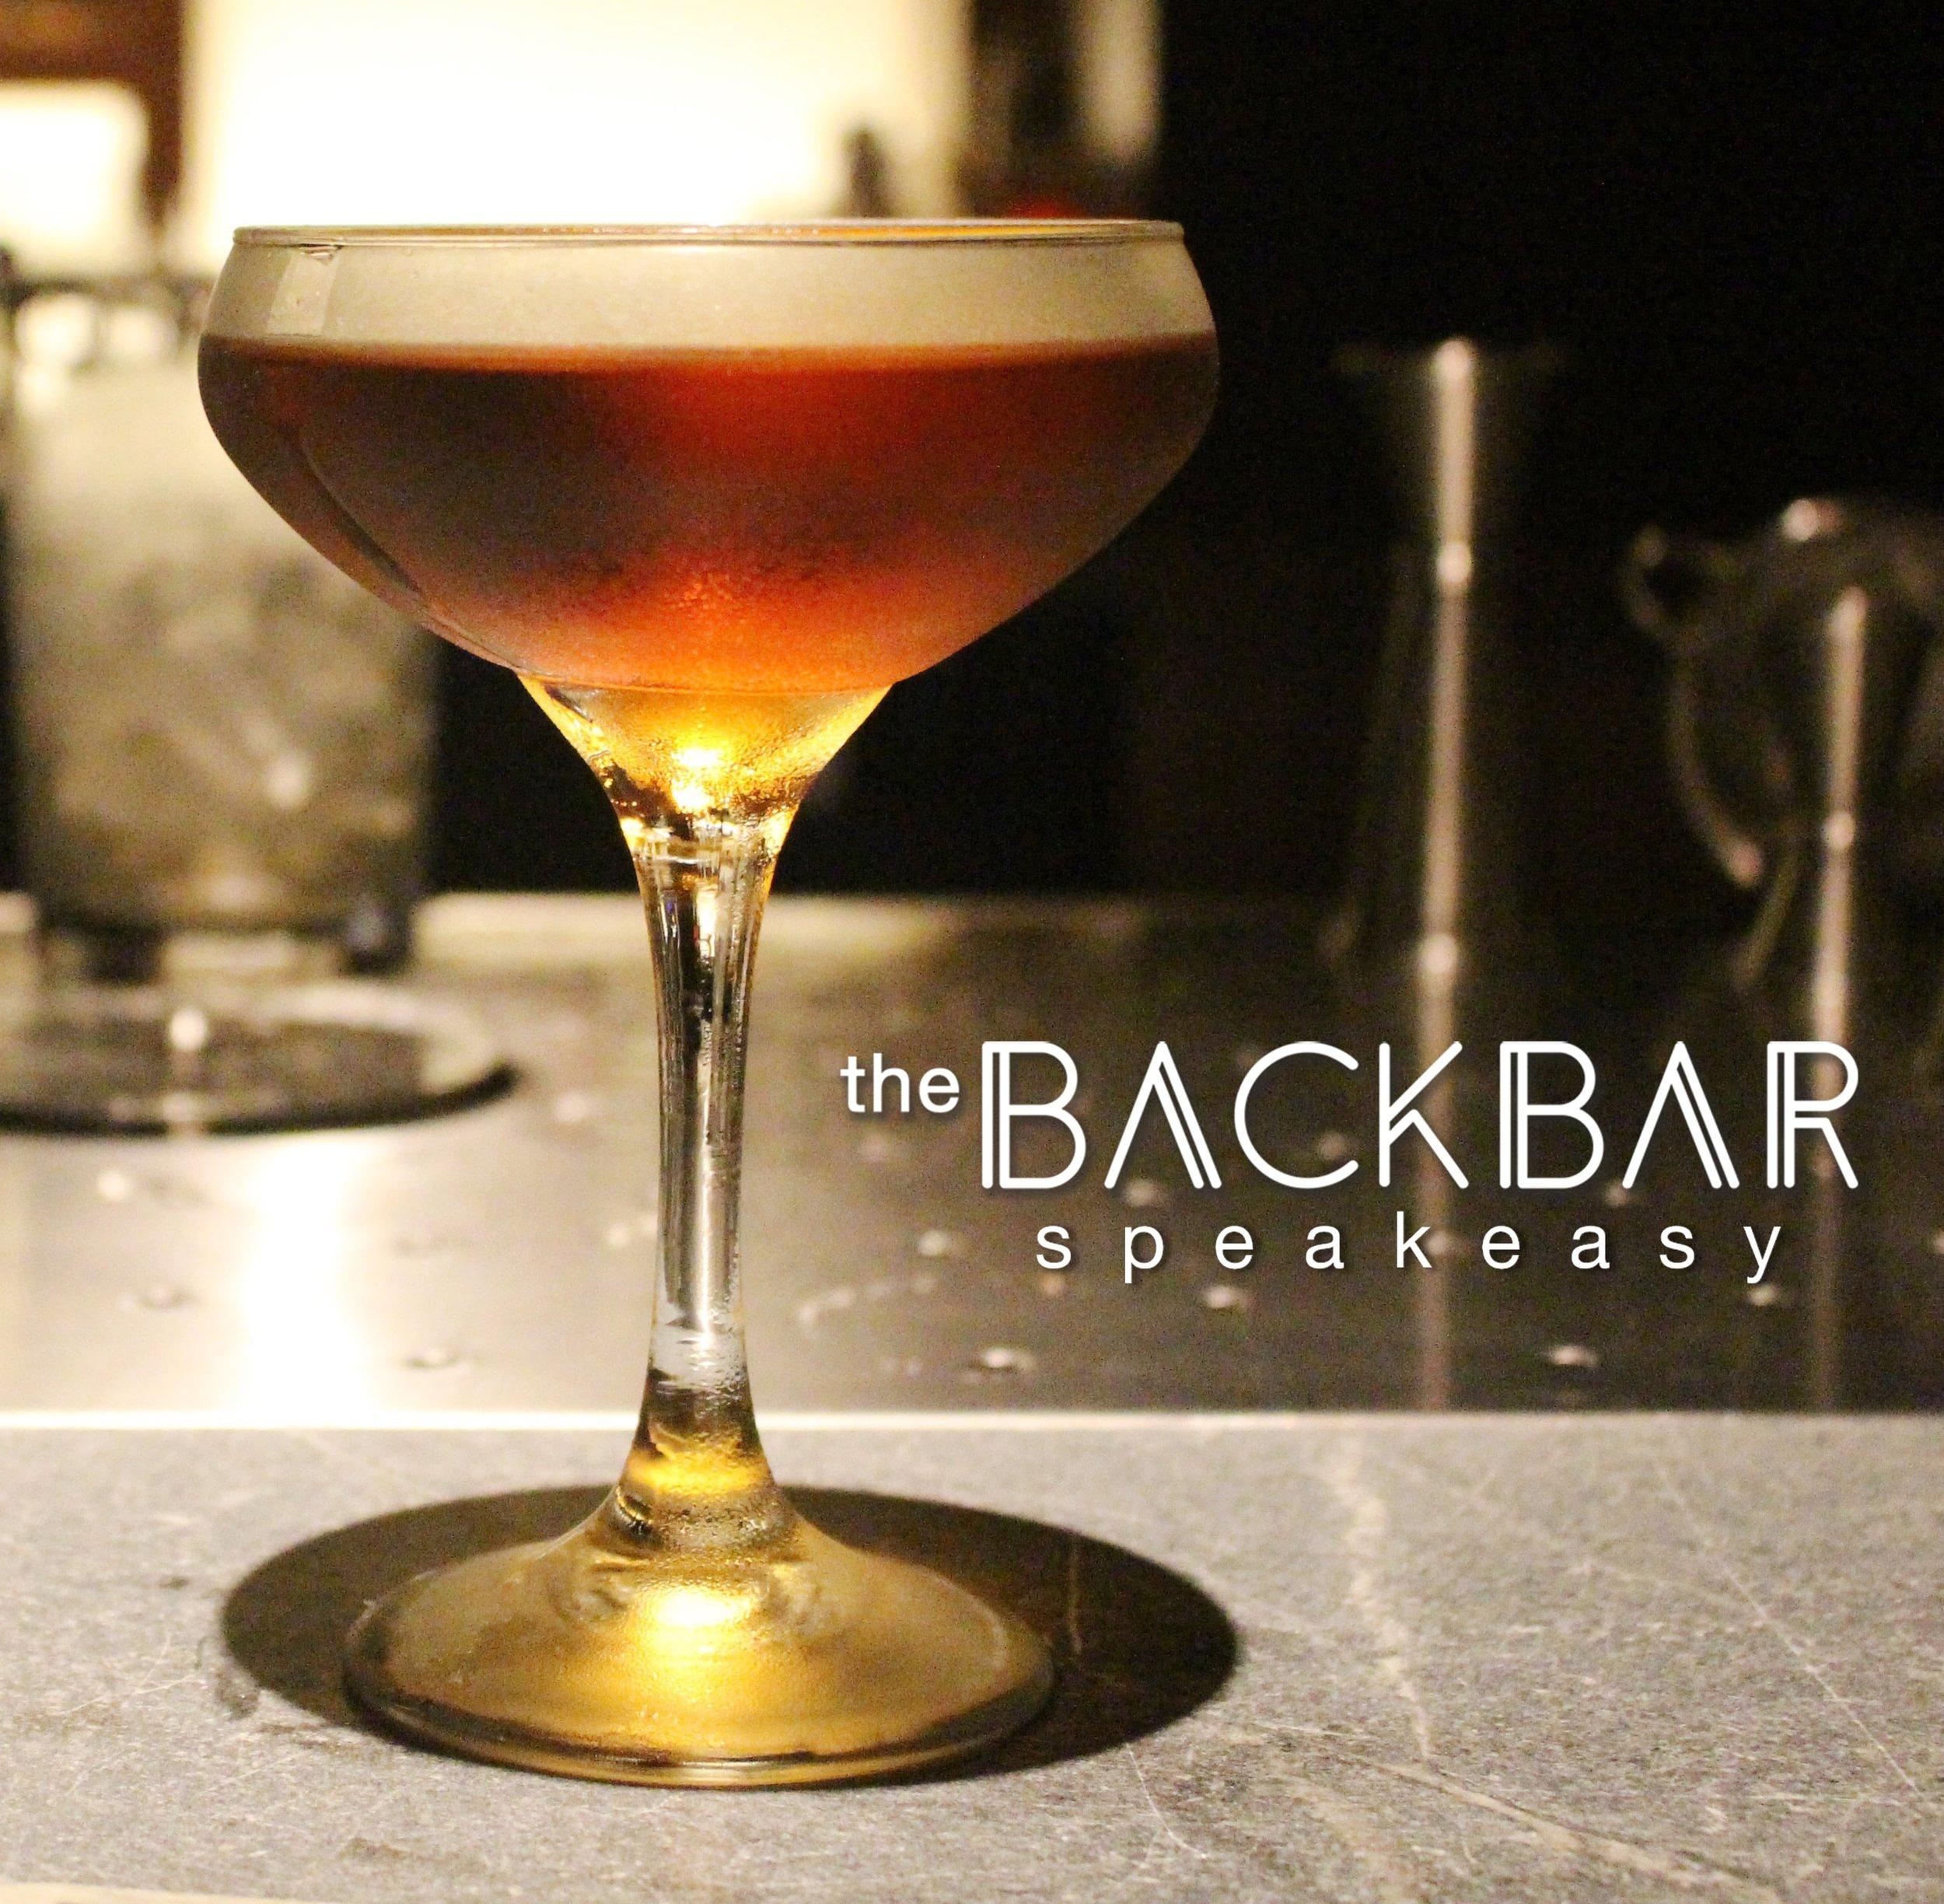 BACKBAR_Preview_Cocktail.jpg